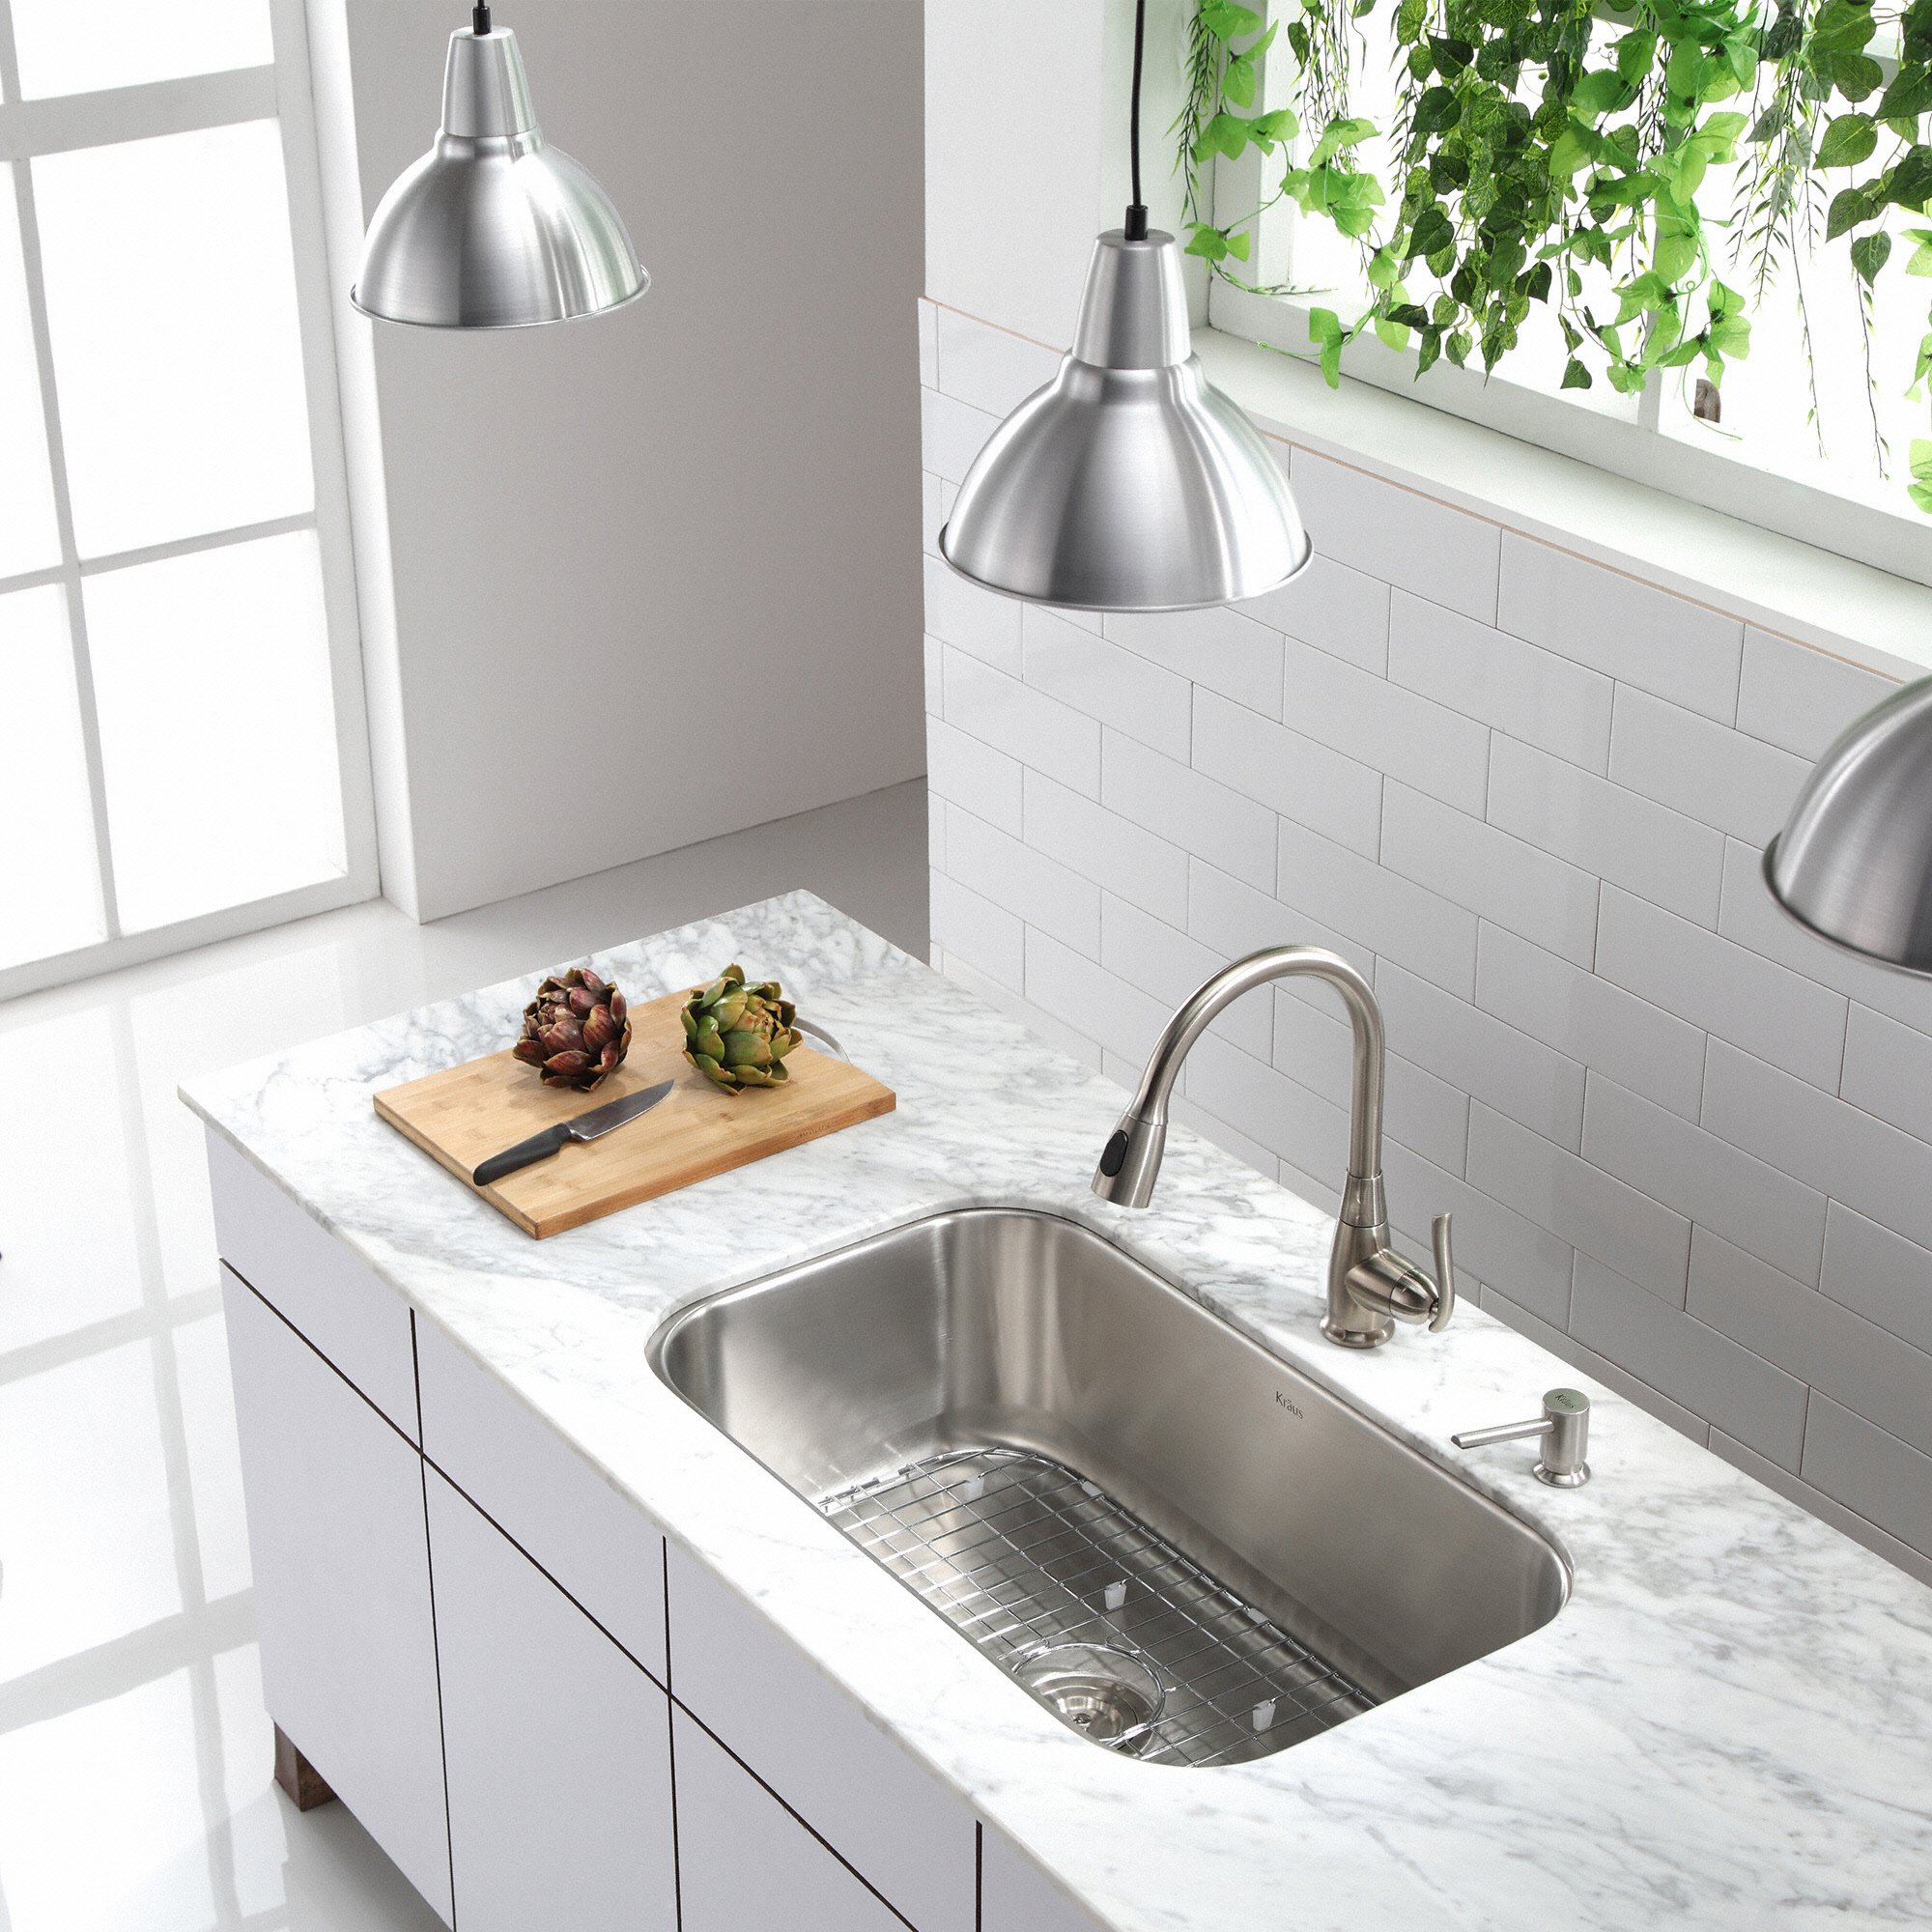 Kraus KBU14 31-1/2 inch Undermount Single Bowl 16-gauge Stainless Steel Kitchen Sink by Kraus (Image #12)